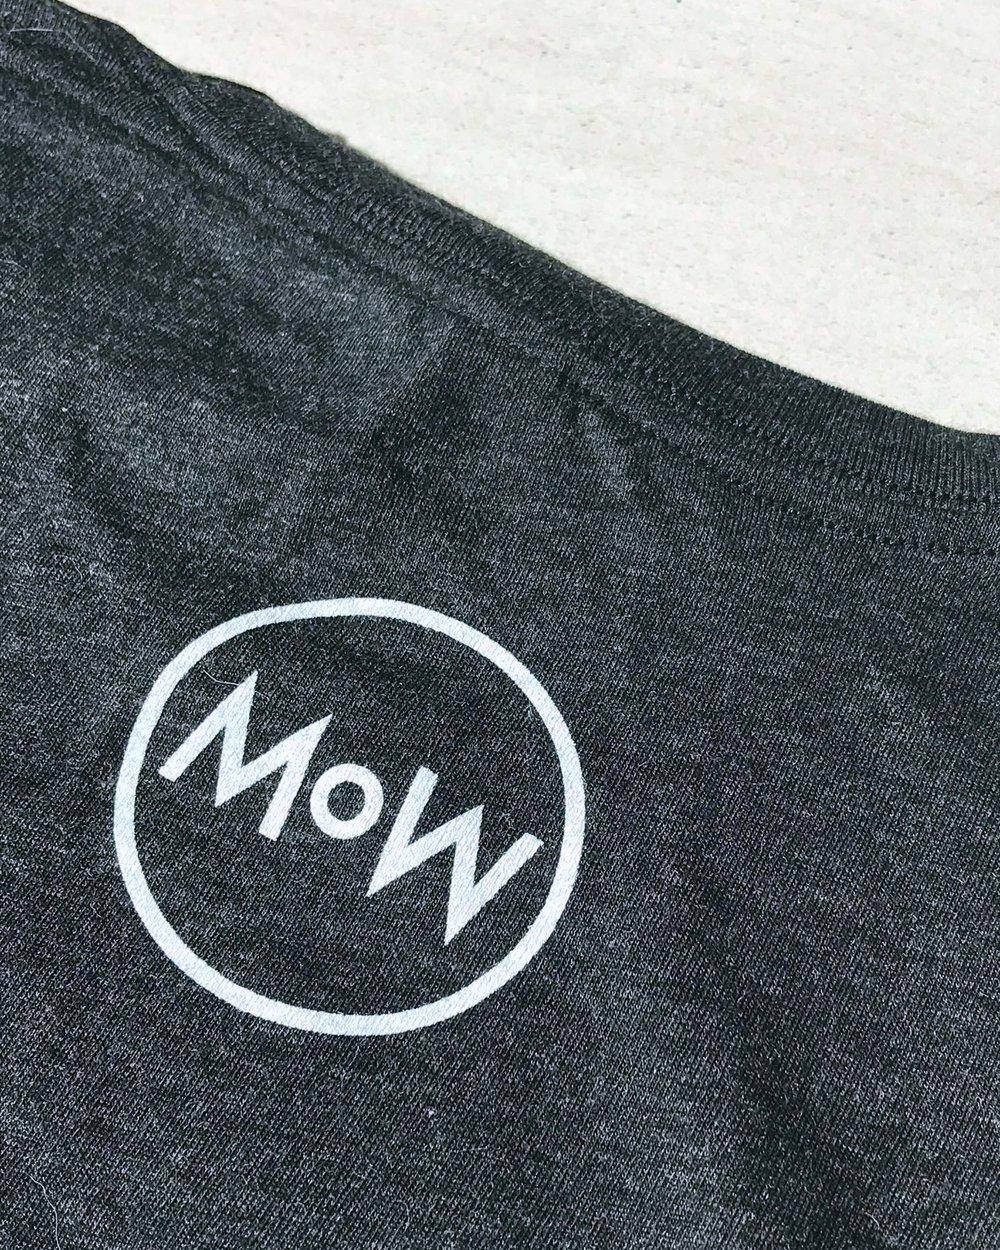 mow-t4.jpg